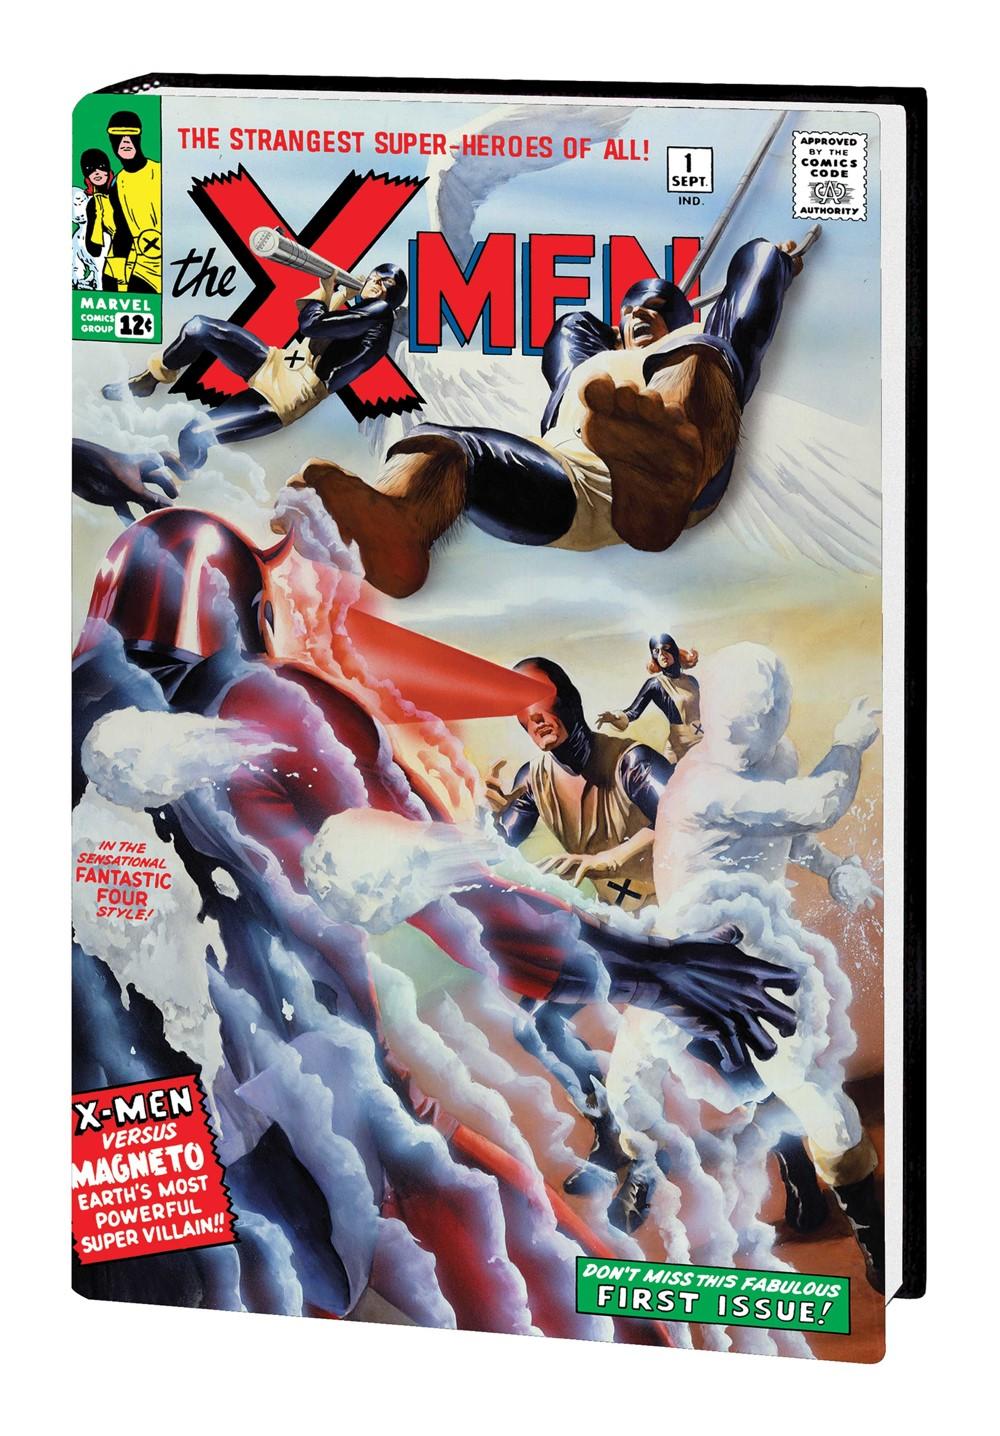 XMEN_OMNI_V1_HC_Ross Marvel Comics September 2021 Solicitations